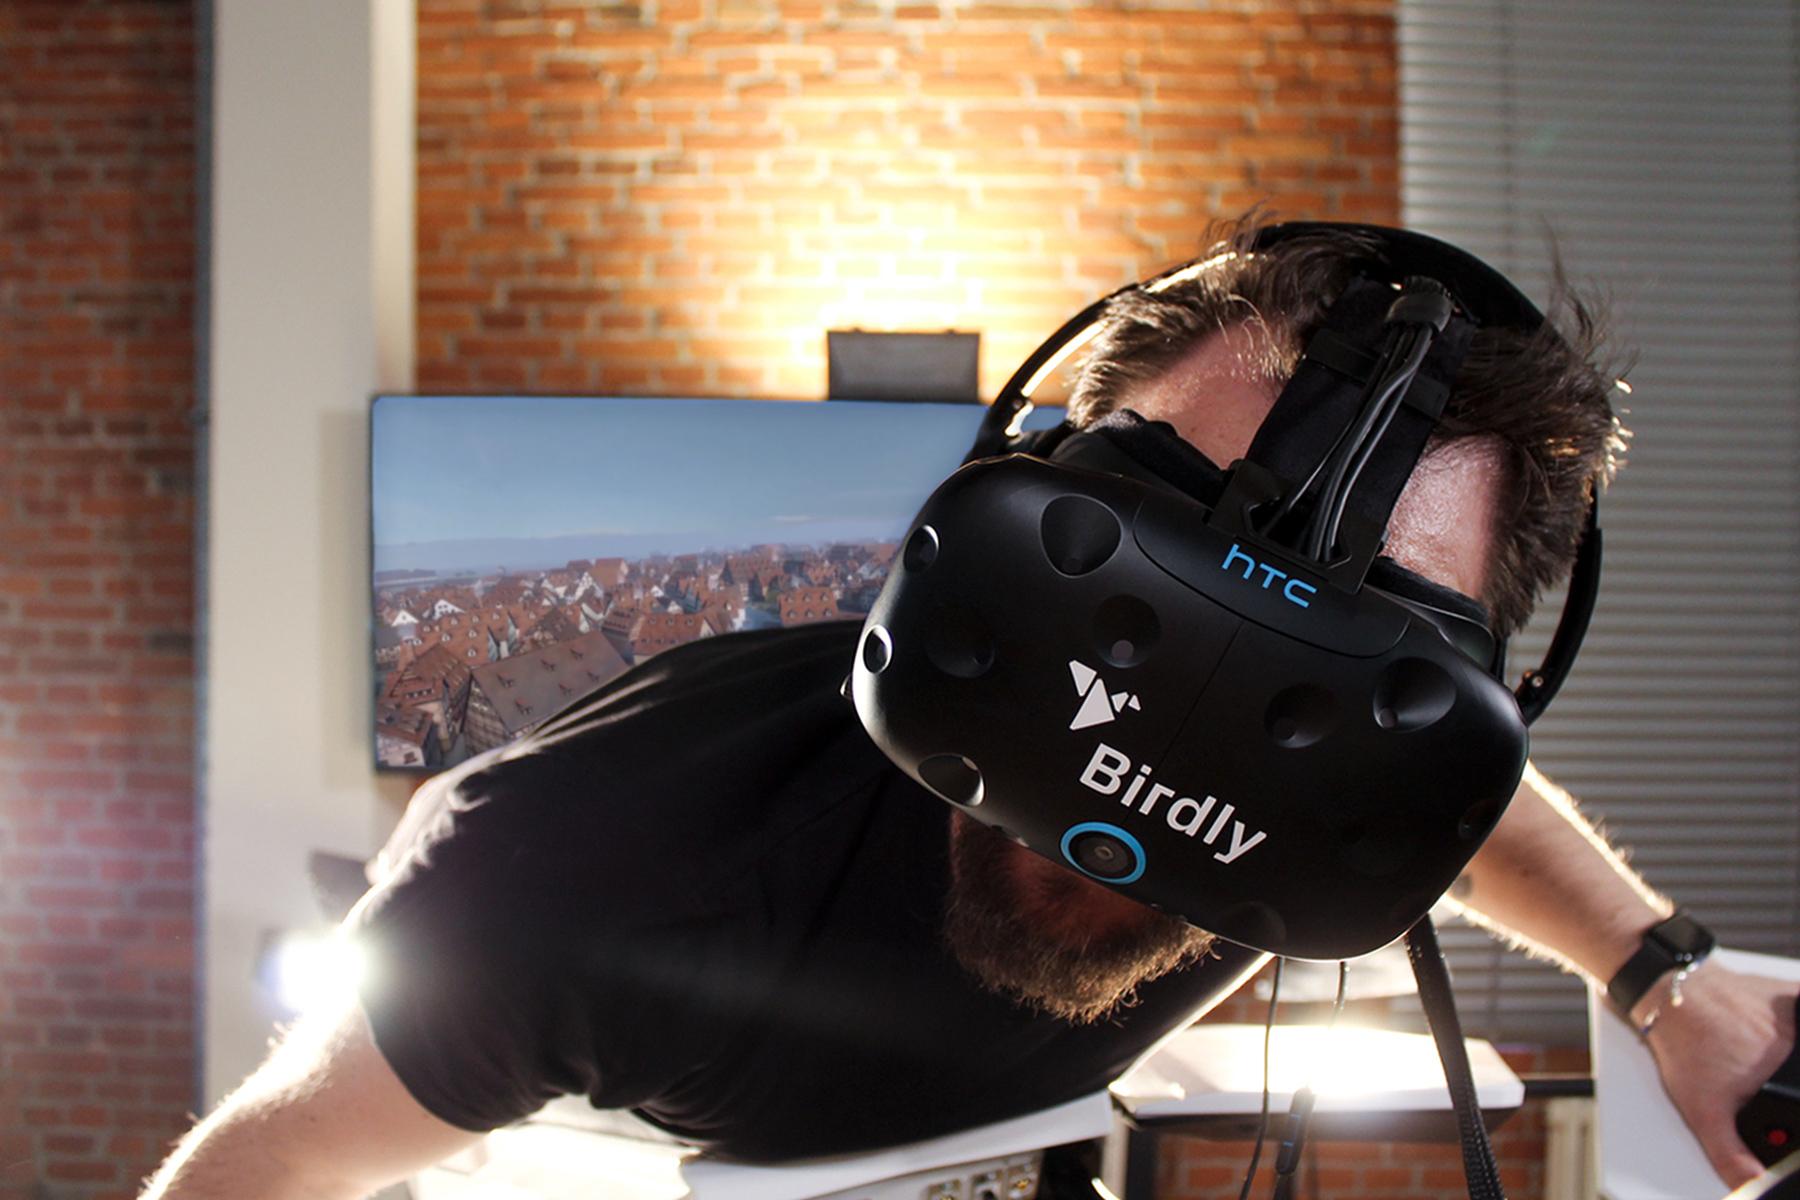 Mayor explores Ulm in Virtual Reality